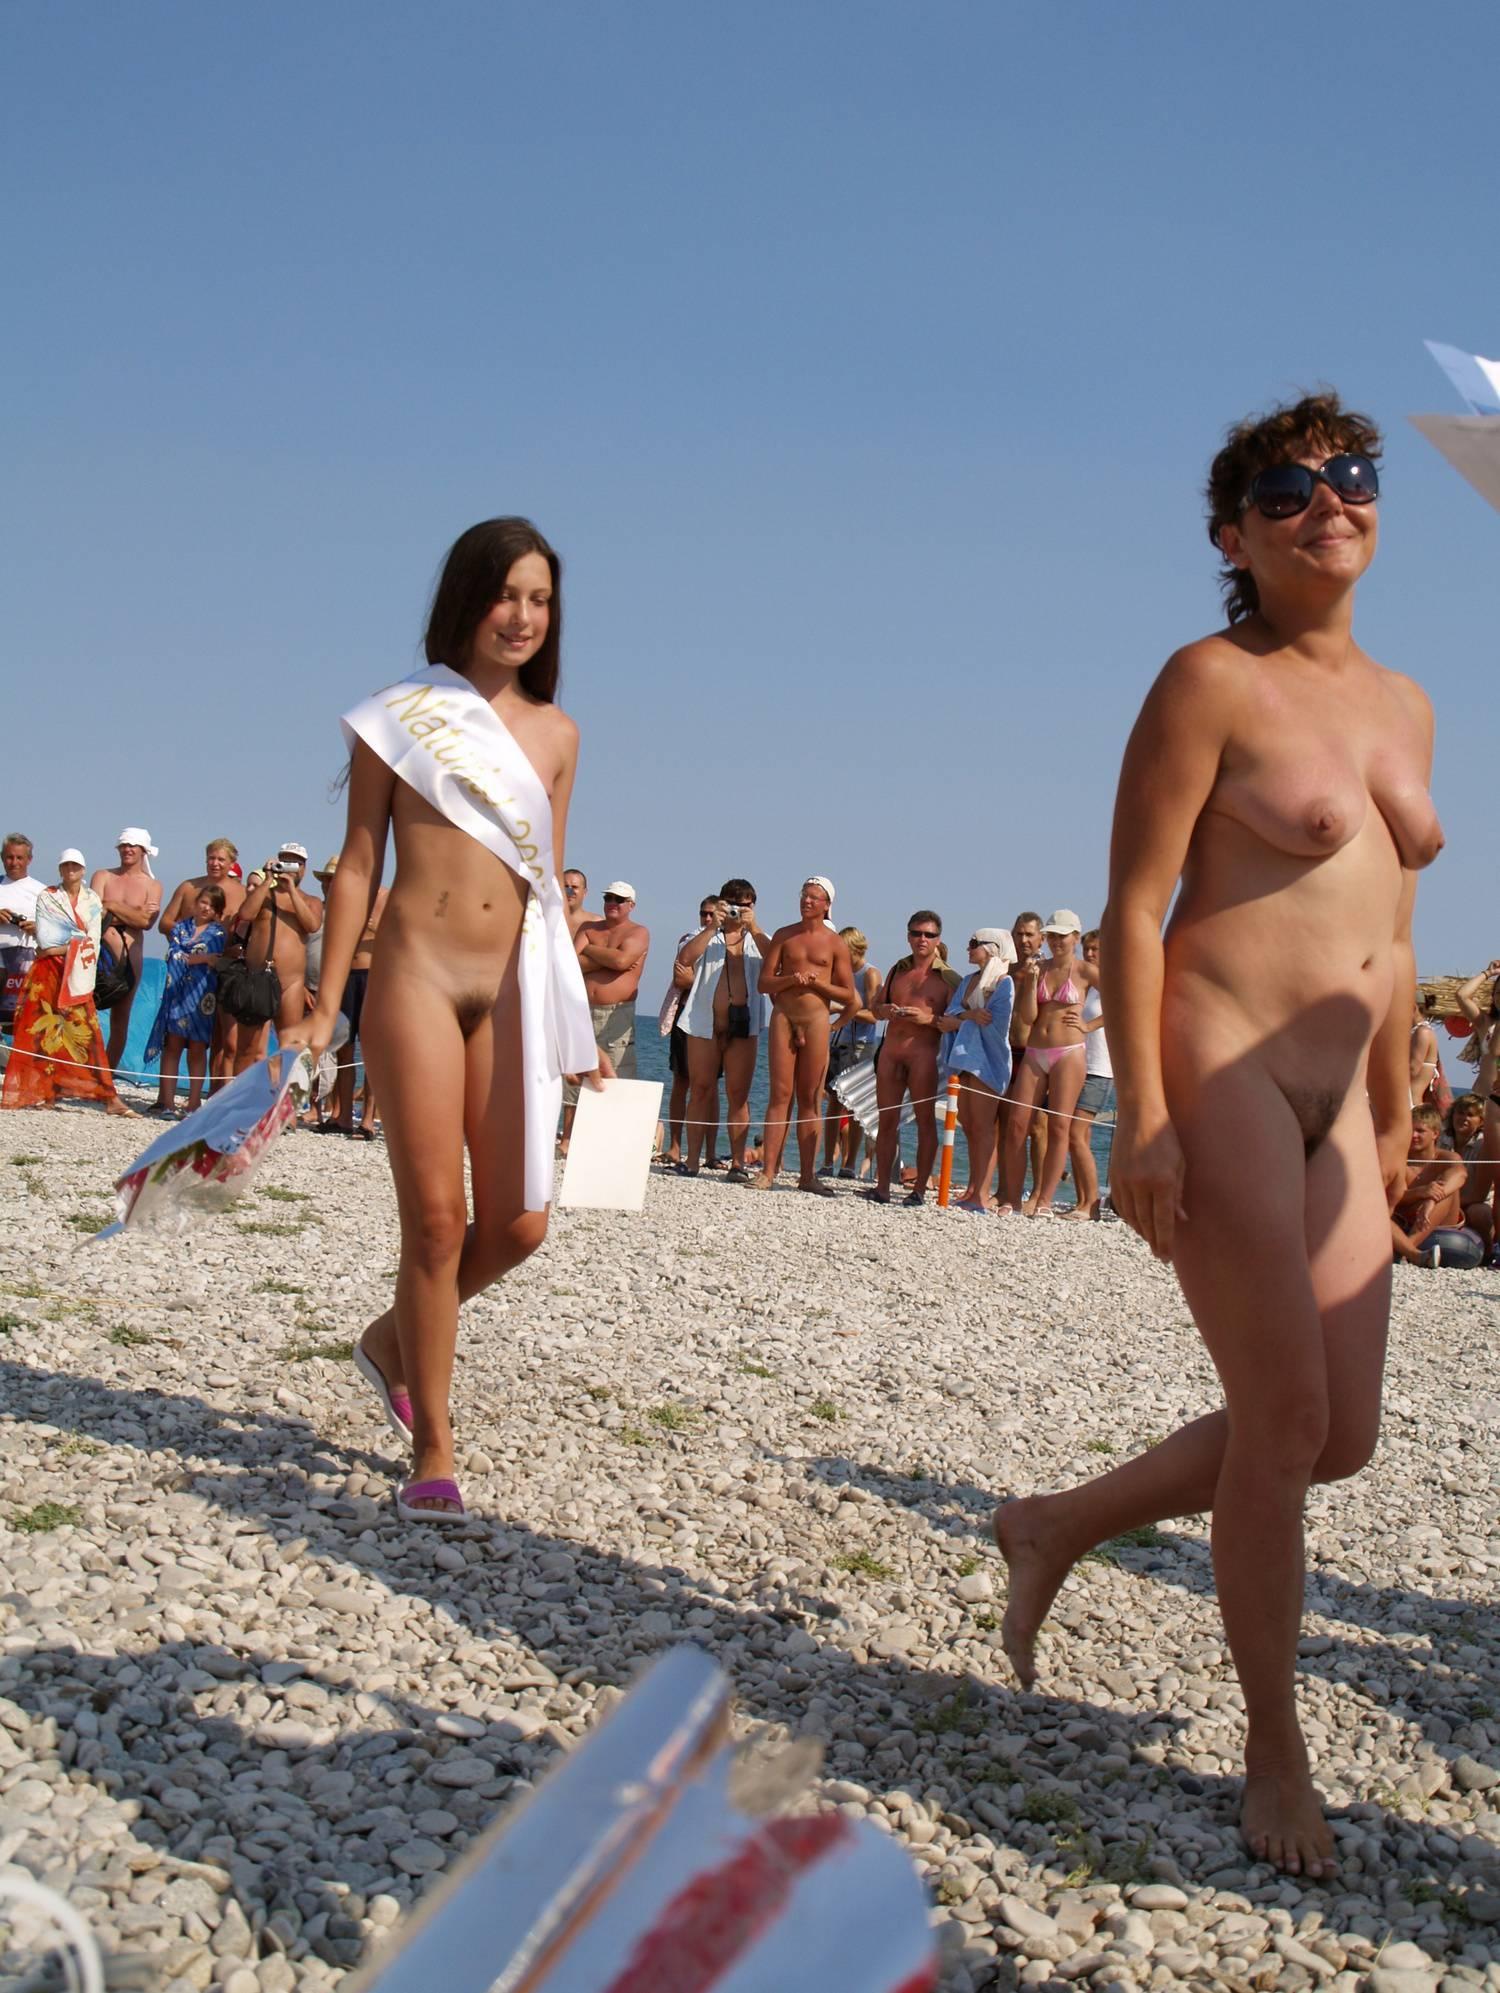 Purenudism Photos-Nude Jr Kids Pageant - 2